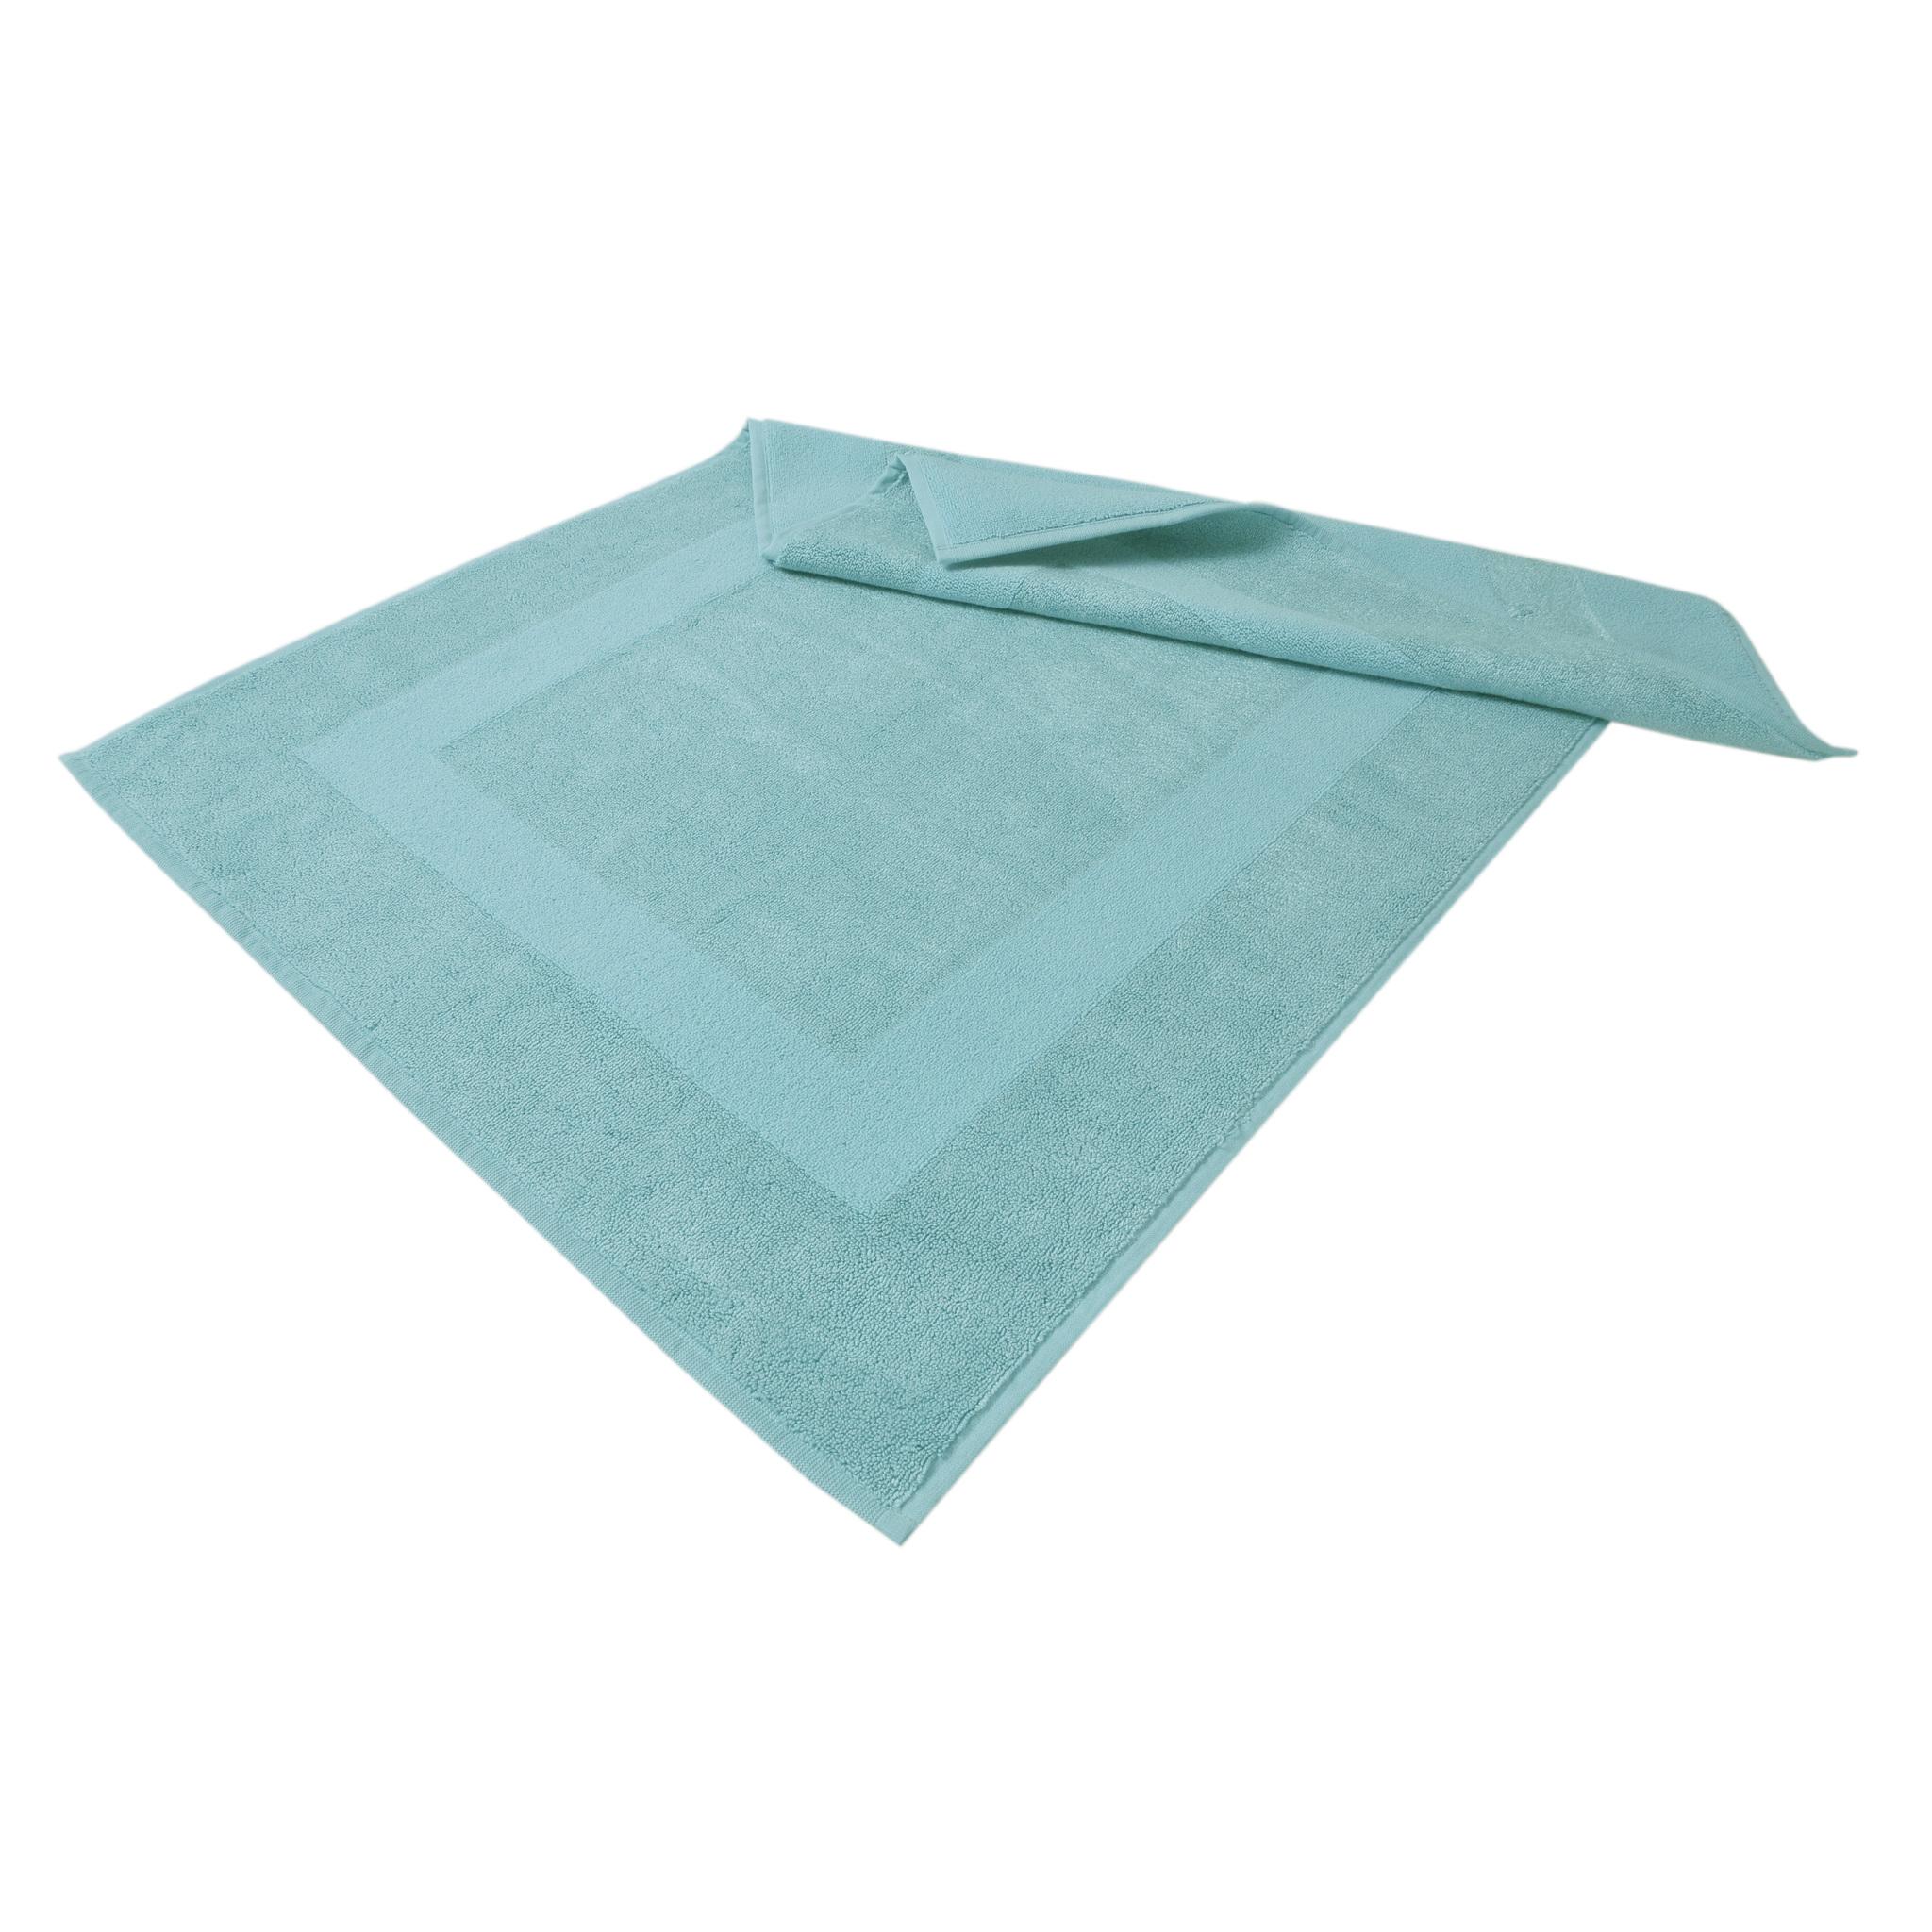 Коврики для ванной Коврик для ванной 60x95 Hamam Glam голубой elitnyy-kovrik-dlya-vannoy-glam-goluboy-ot-hamam-turtsiya.jpg